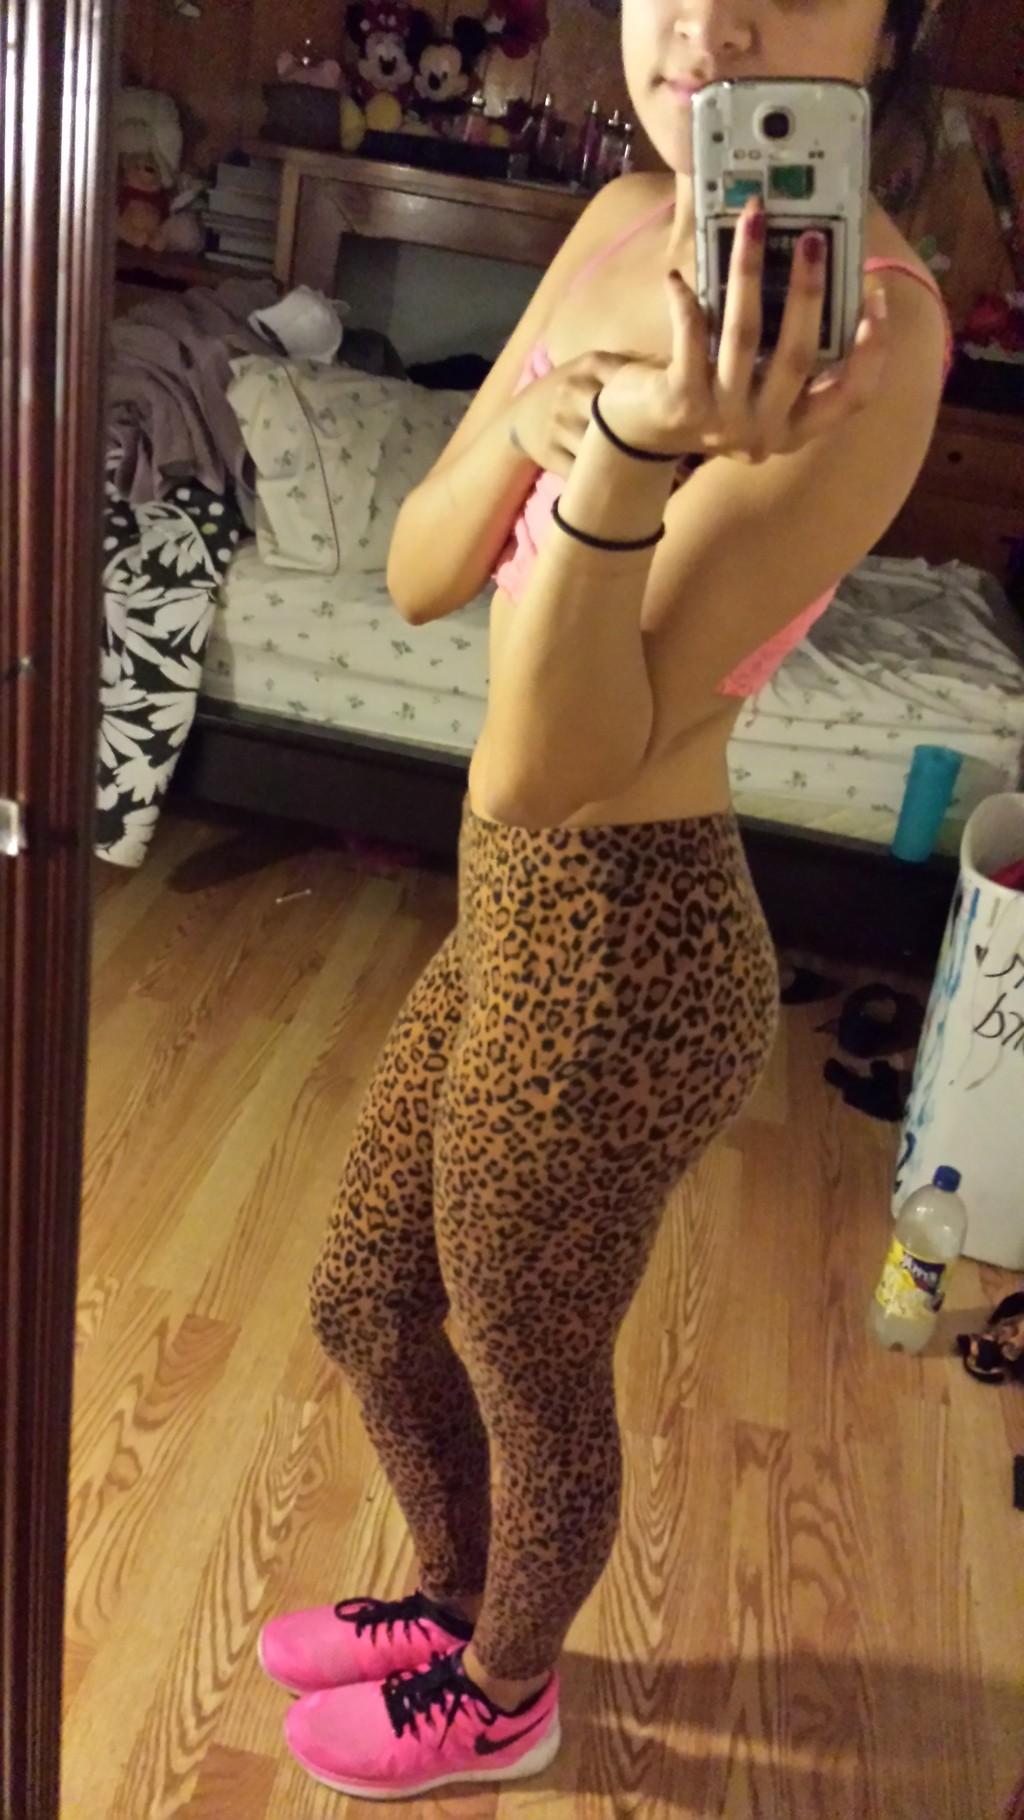 Mi Ex Desnuda por Wassap Fotos Cahondas - novia-adicta-pinga-vagina-tetas-puta-snapchat-xxx-facebook-like-zorra-extremo-anal (1)